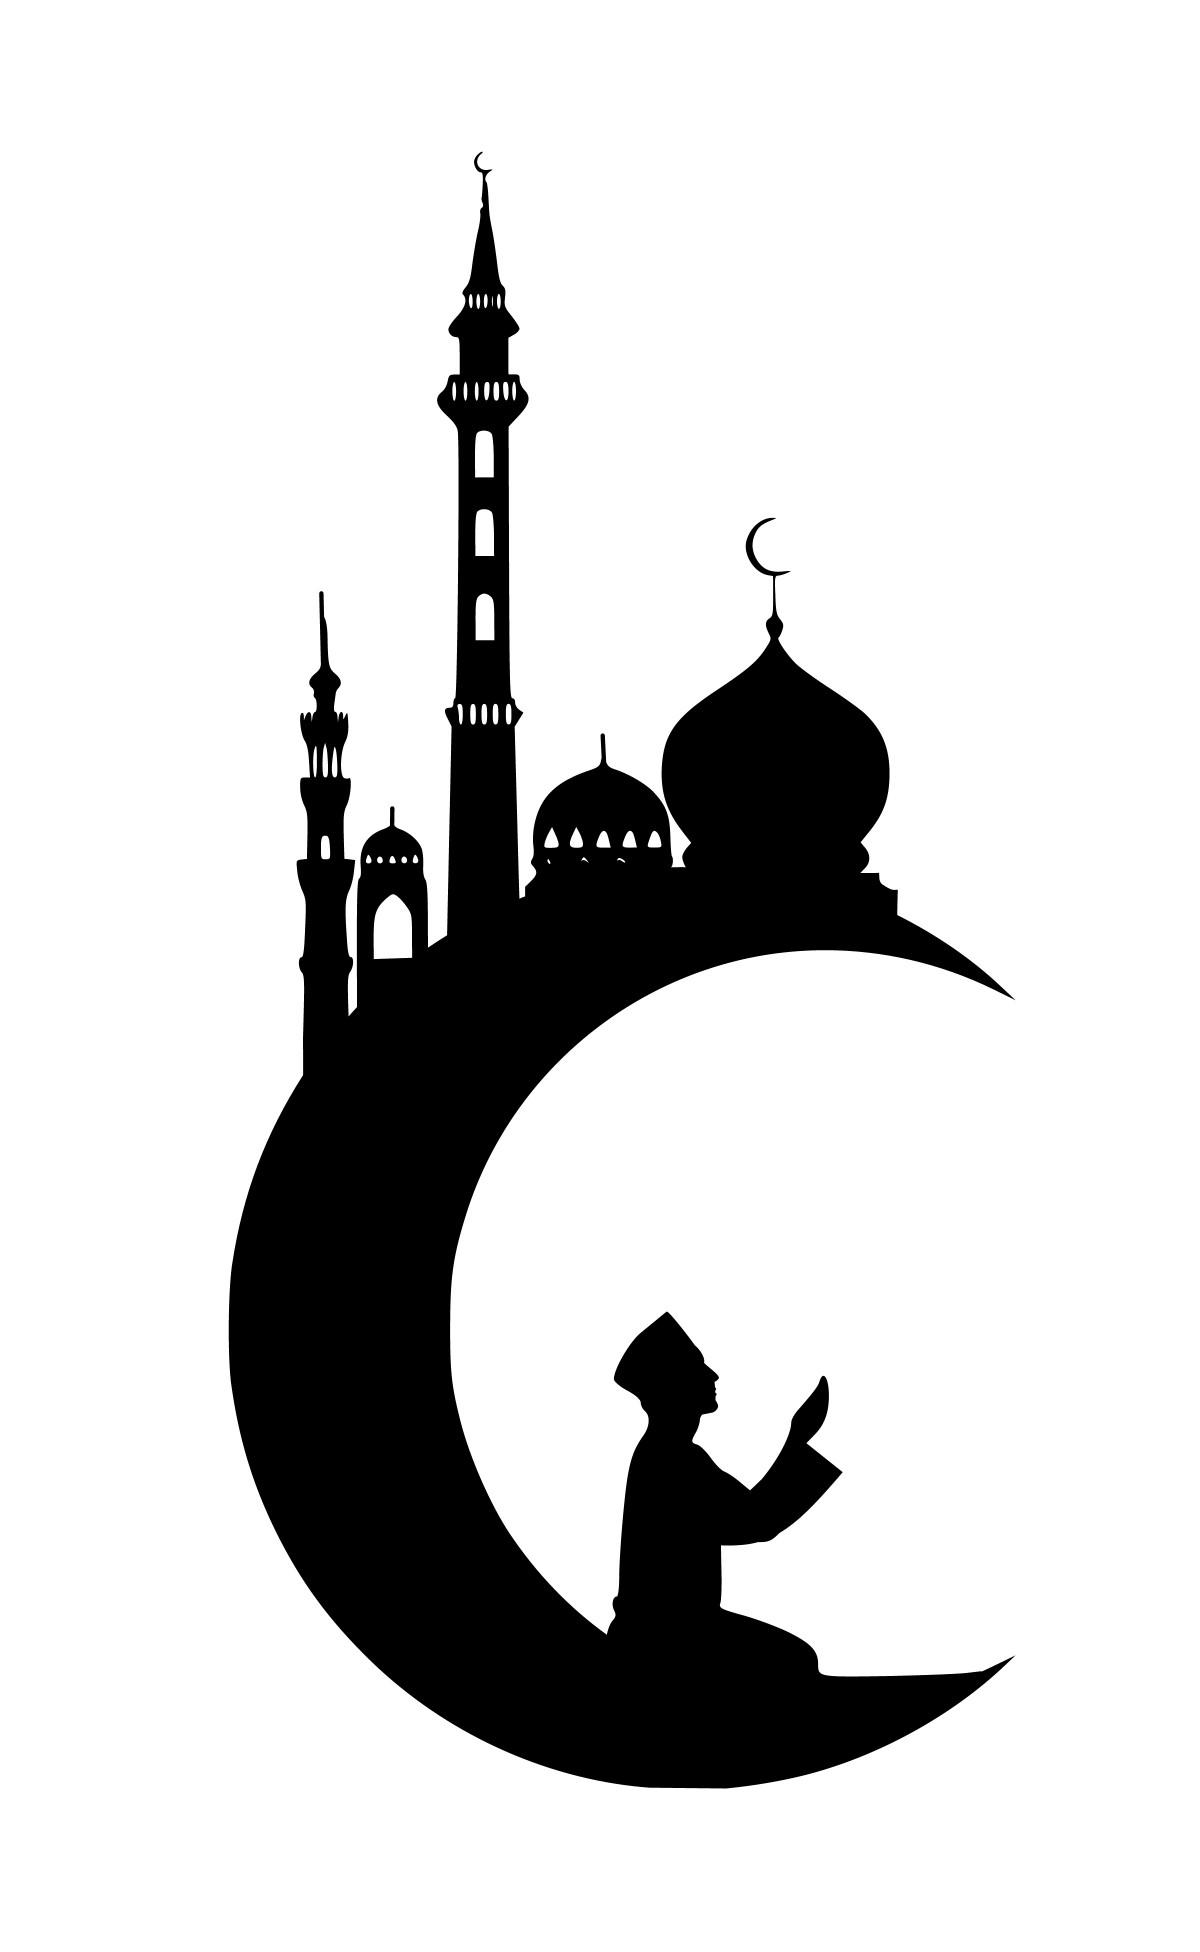 Free Images : ramadan, kareem, moon, masjid, eid, arabic ...